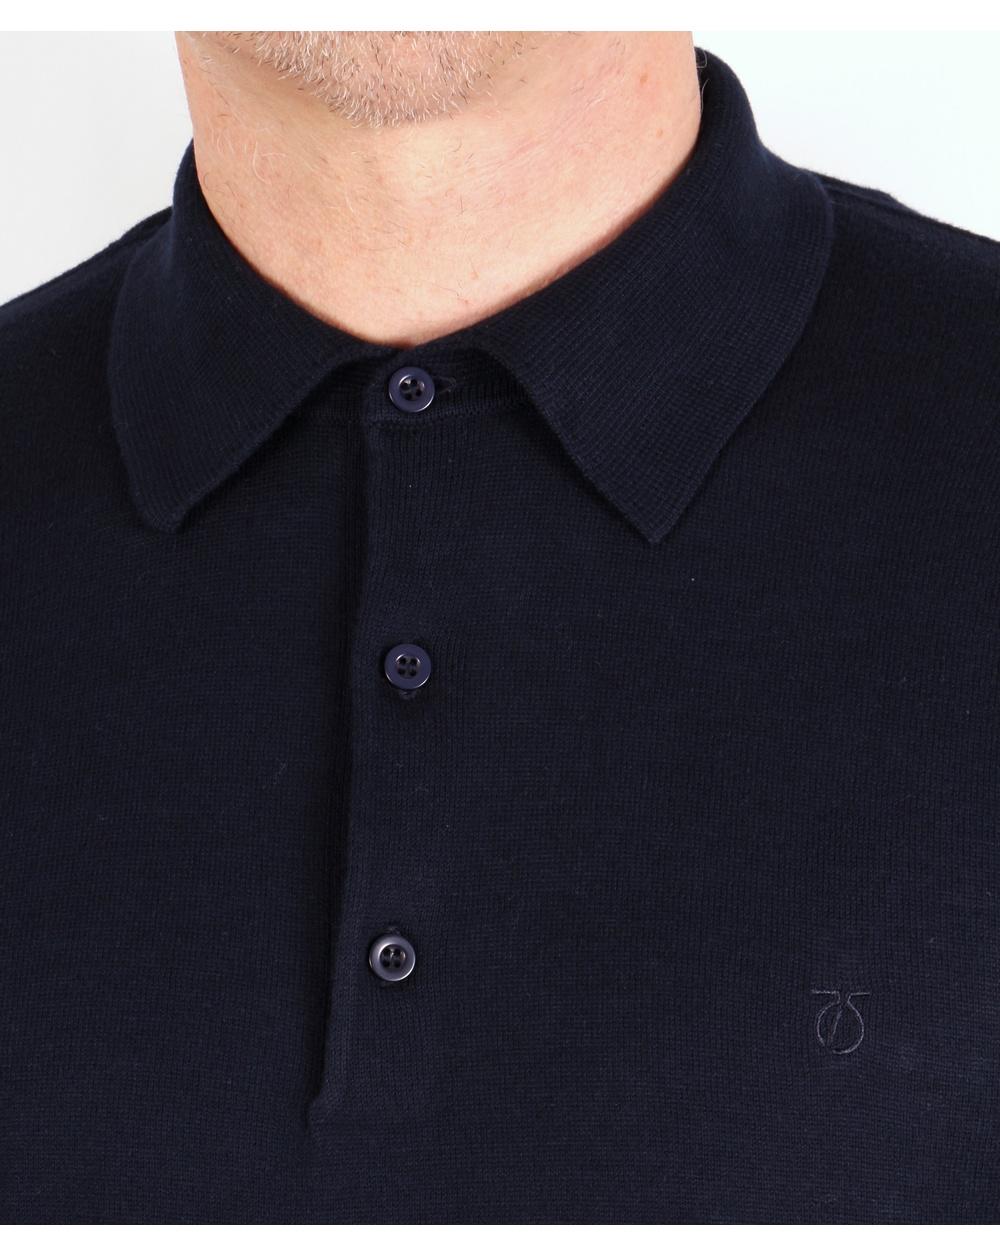 Peter Werth Hemingford Knitted Polo Shirt Navy Mens Cotton